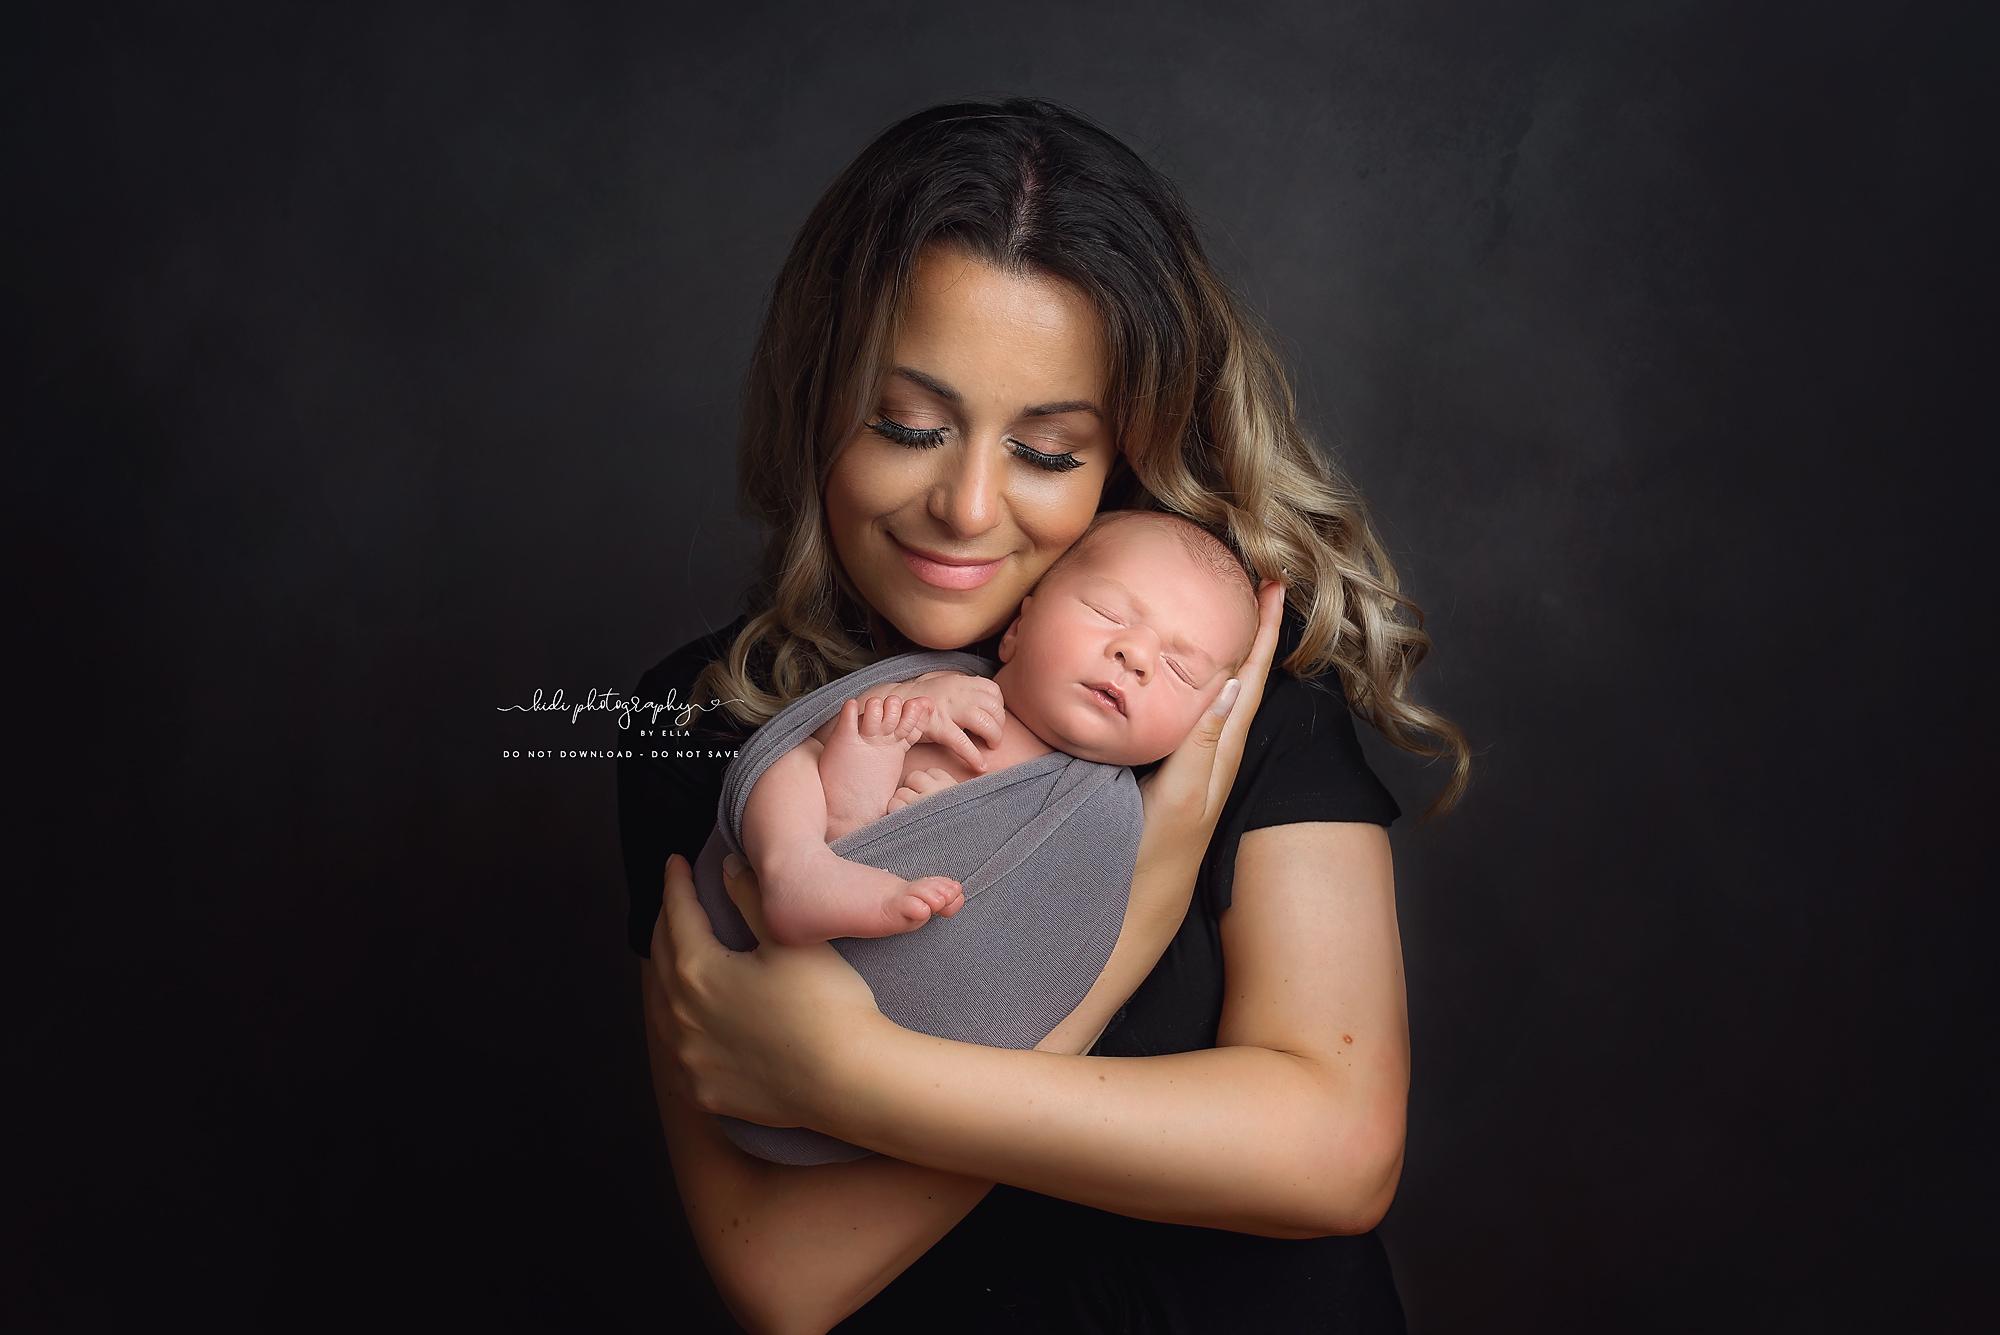 Kidi Photography by Ella newborn photo session